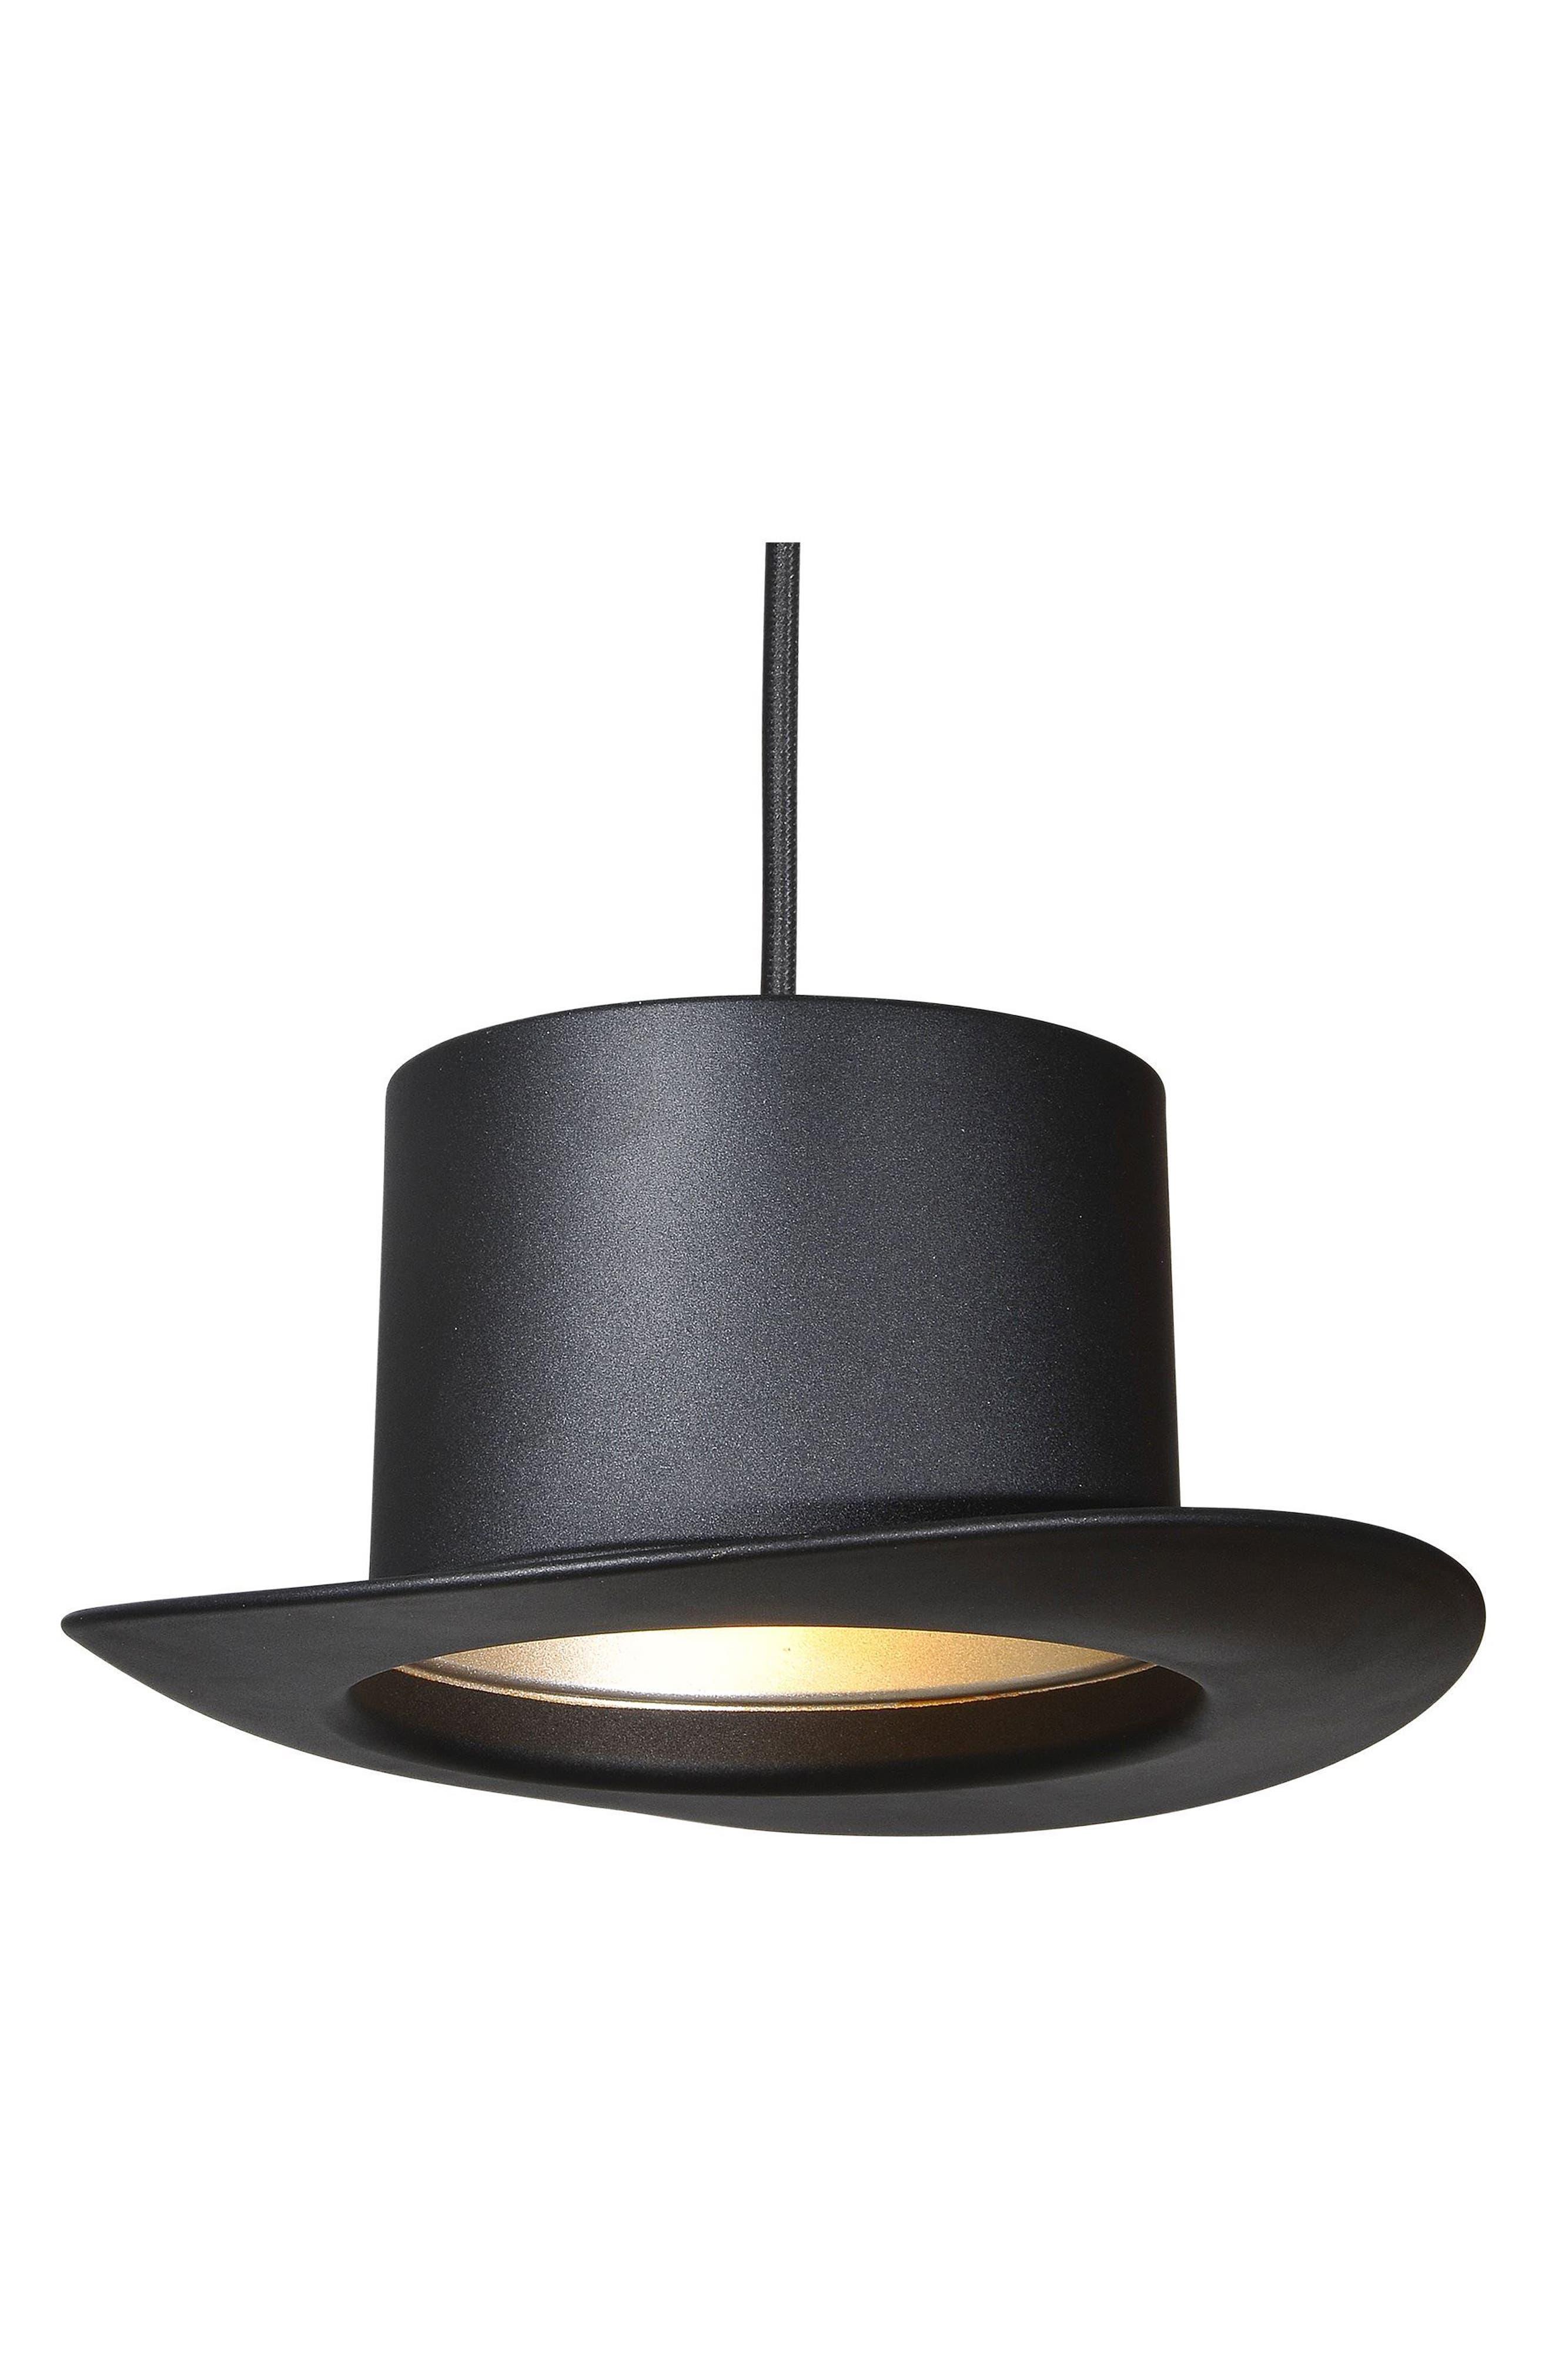 Langley Top Hat Ceiling Fixture,                             Alternate thumbnail 3, color,                             Black